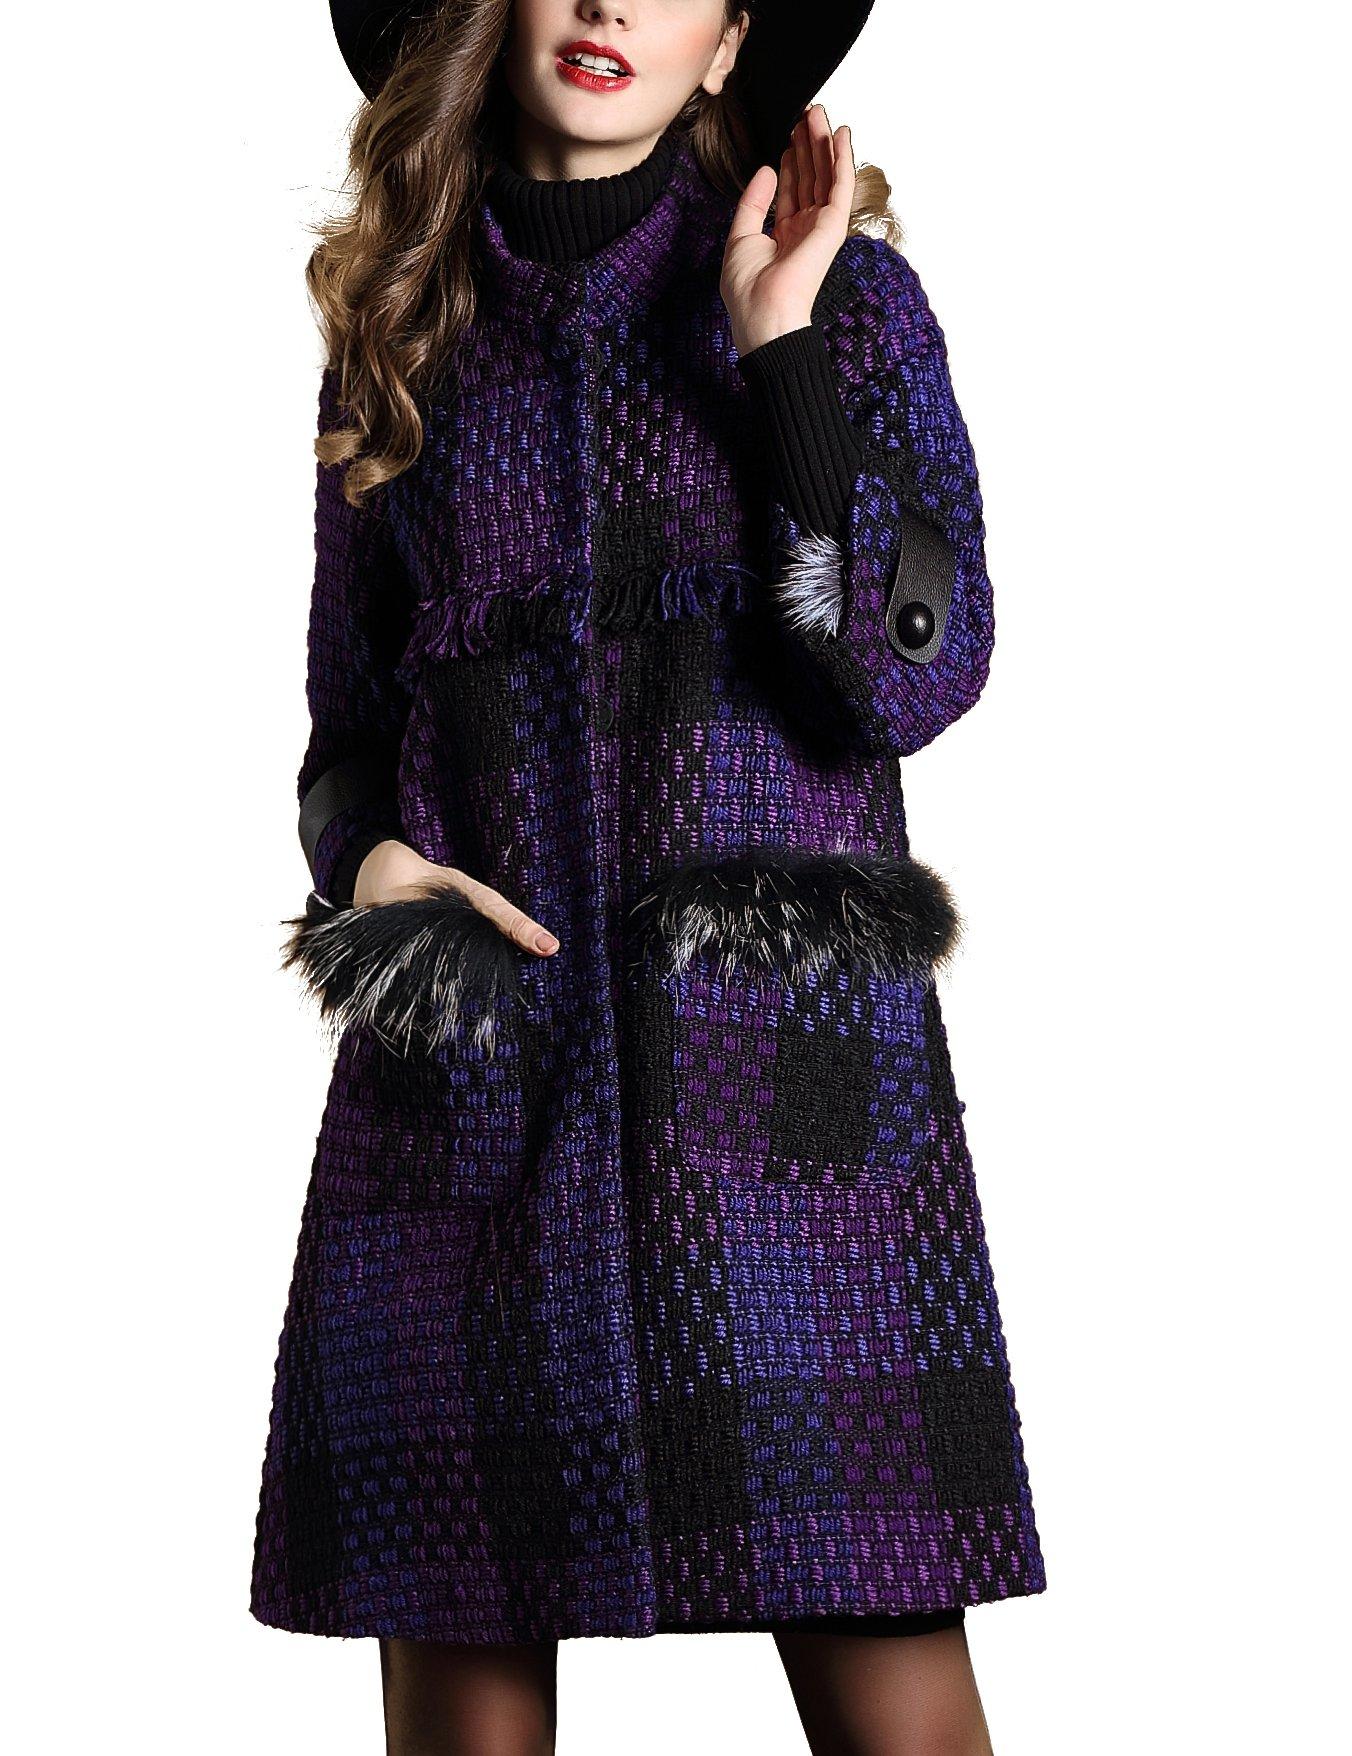 DanMunier Women's Winter Classic Double-Breasted Coat #4358 (M, Purple) by DanMunier (Image #4)